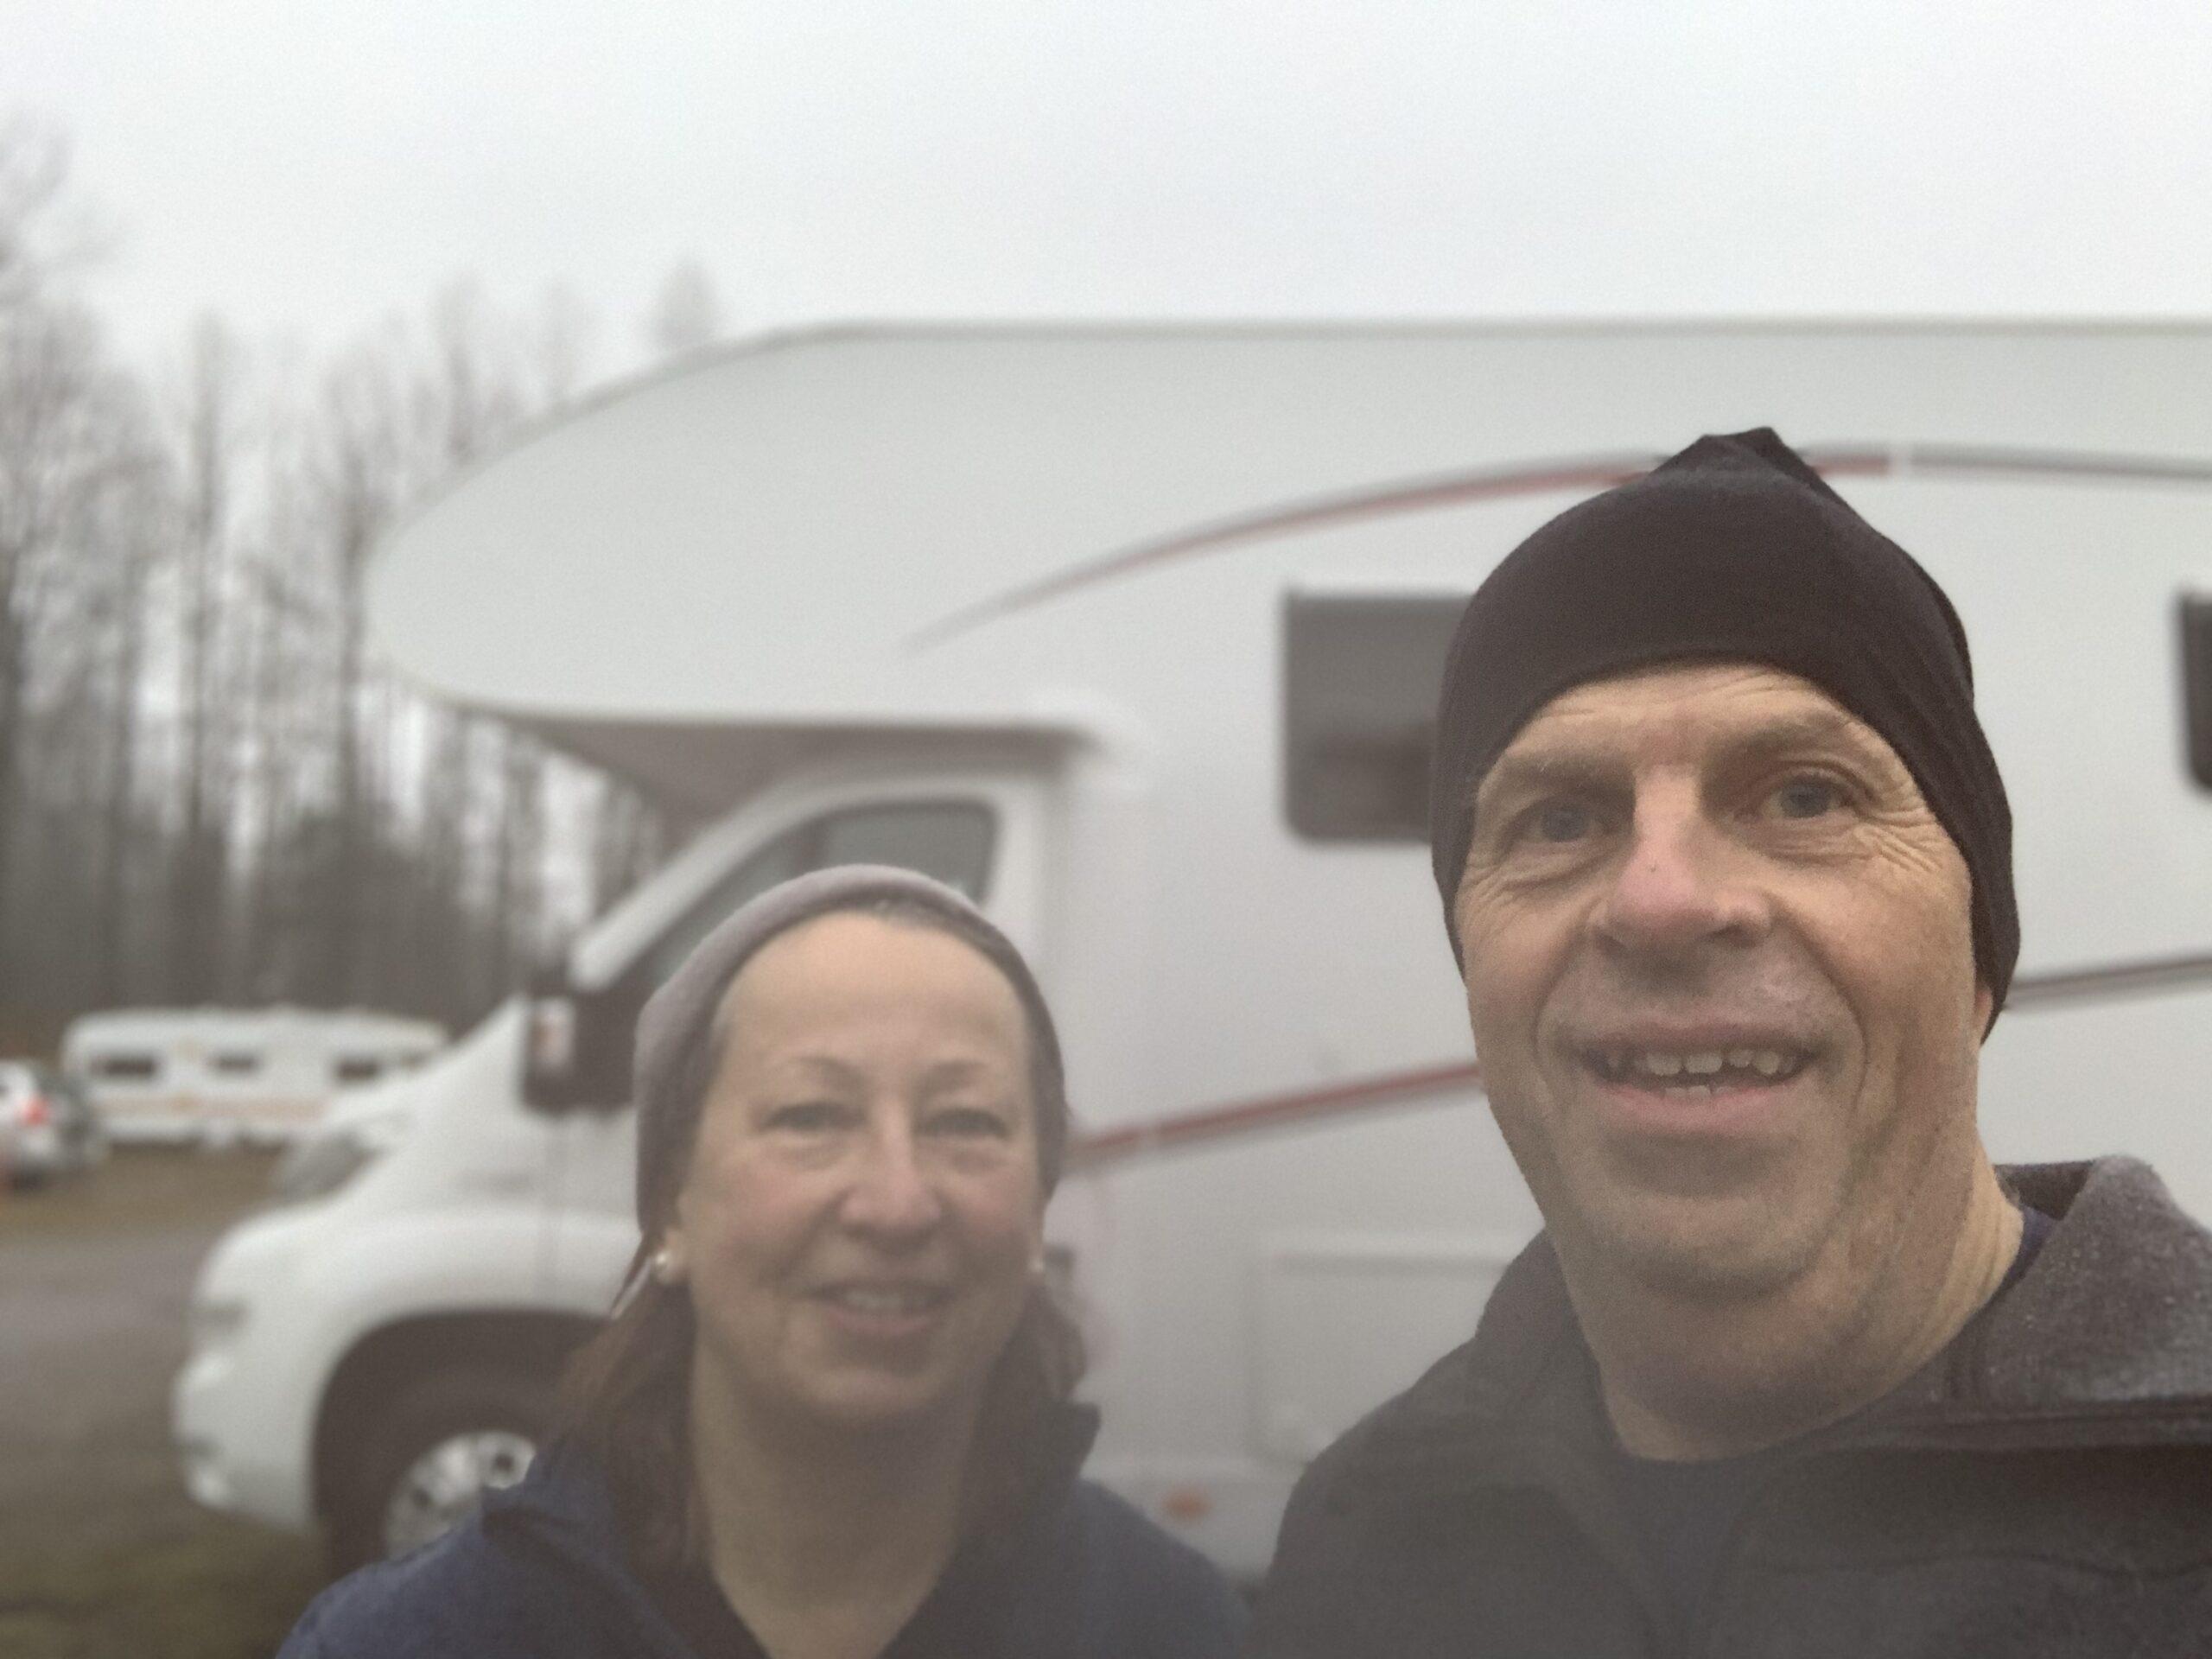 First Camp – Norra Europas största campingkedja